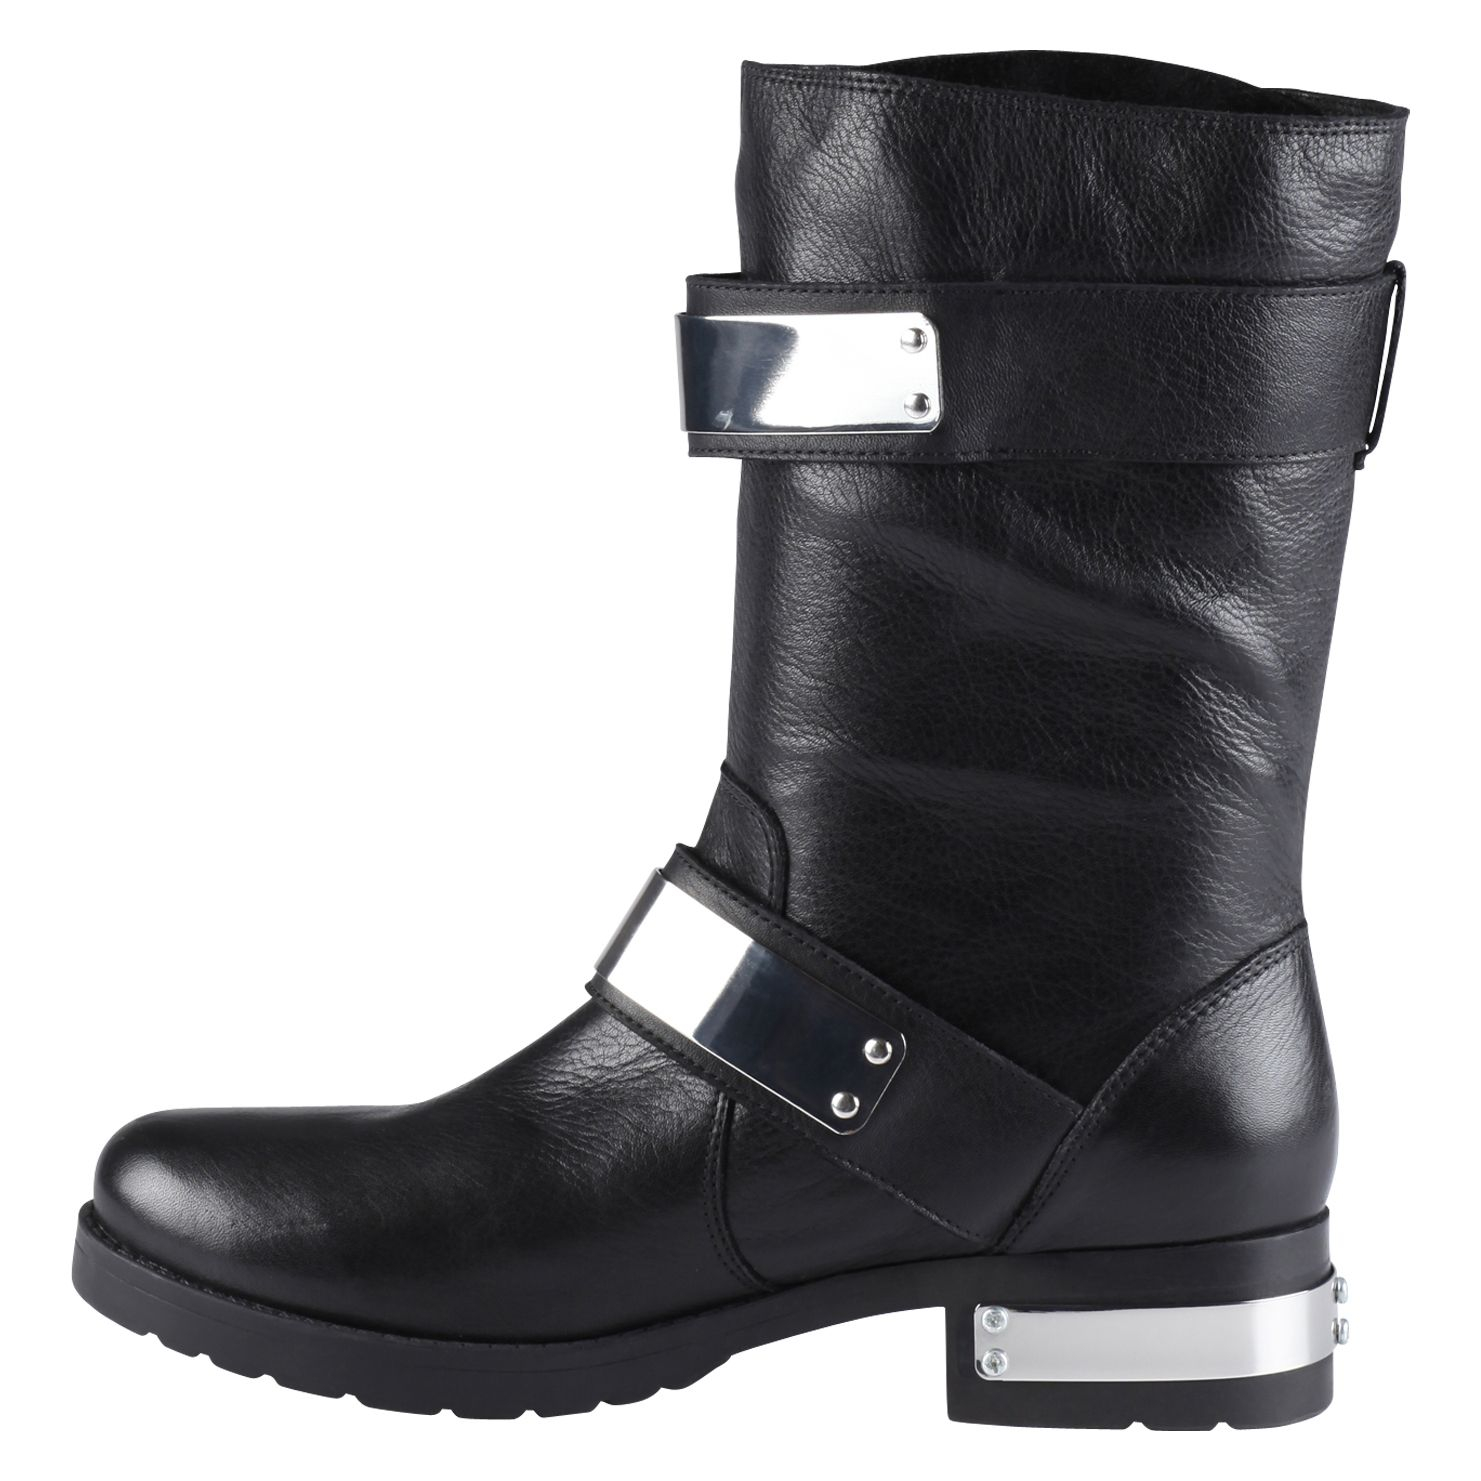 ALDO Annelisse Boots in Black